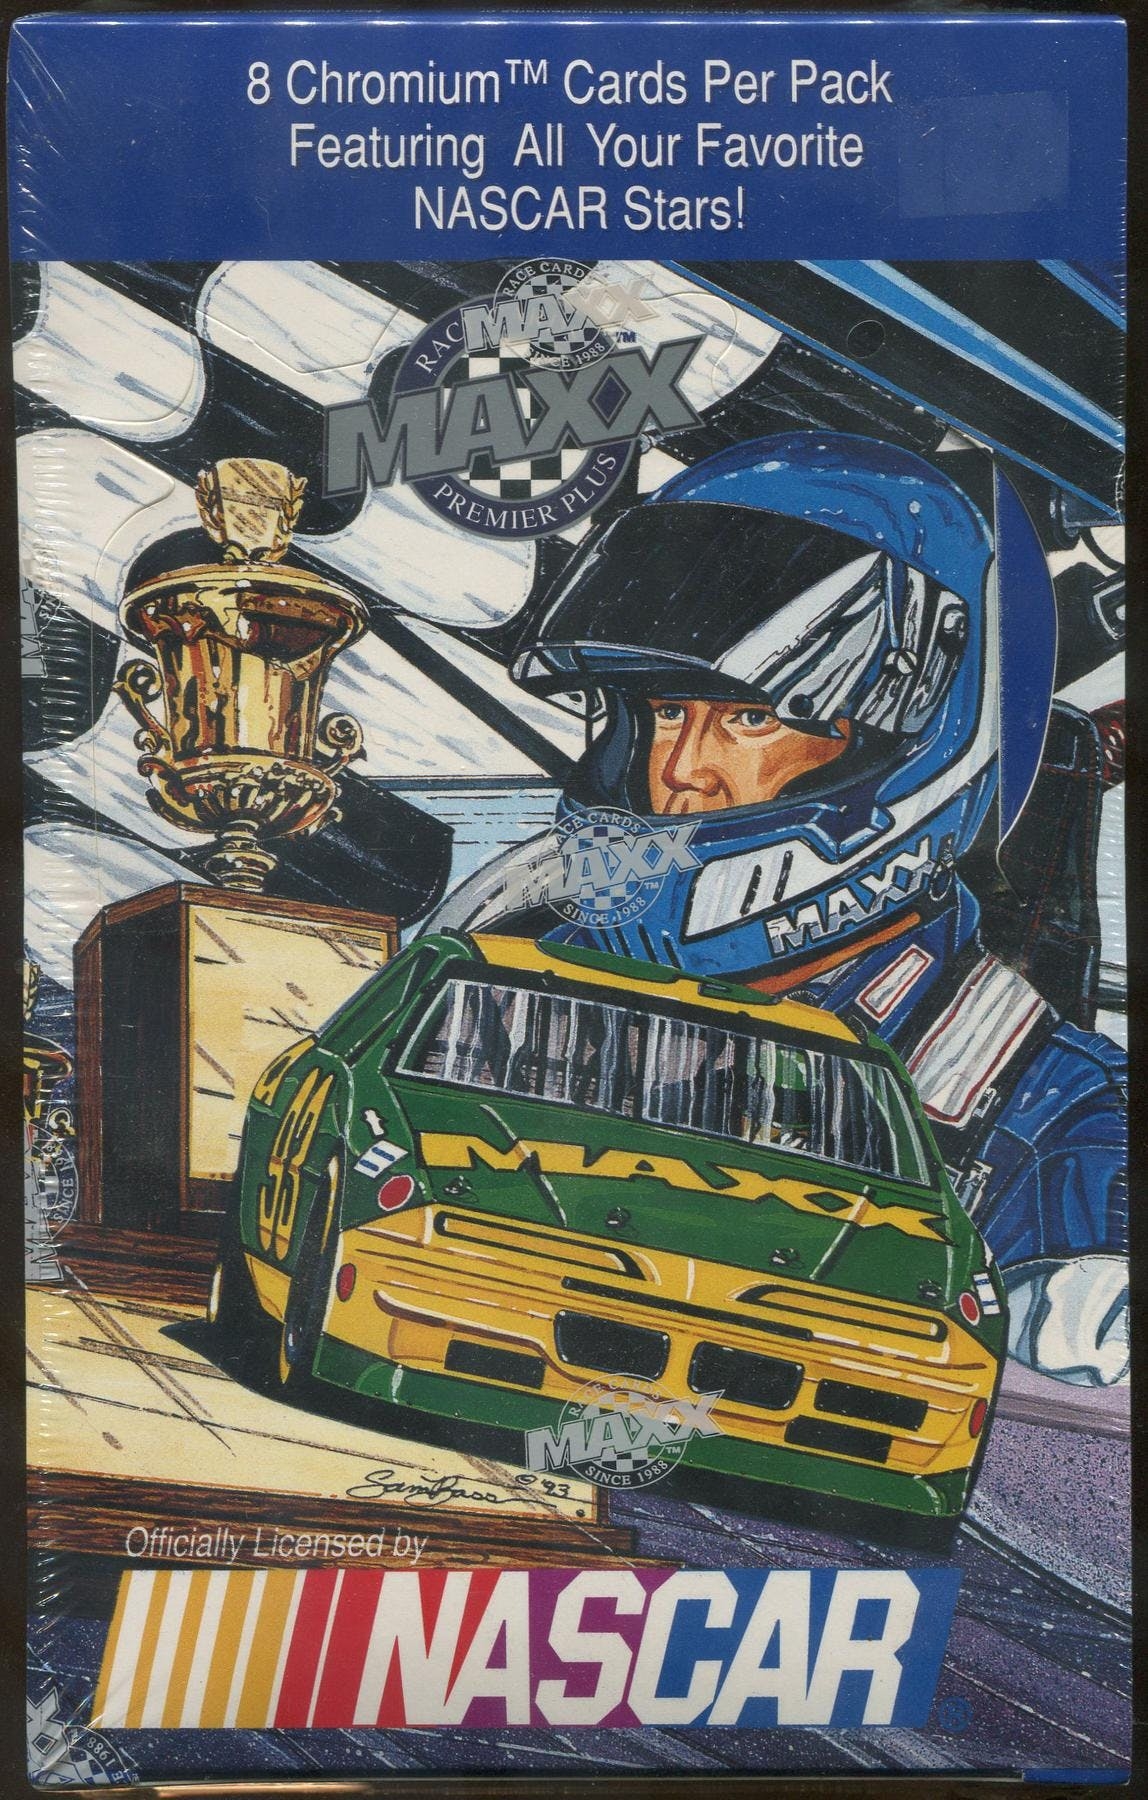 1993 J.R. Maxx Inc. Maxx Premier Plus Racing Hobby Box | DA Card World